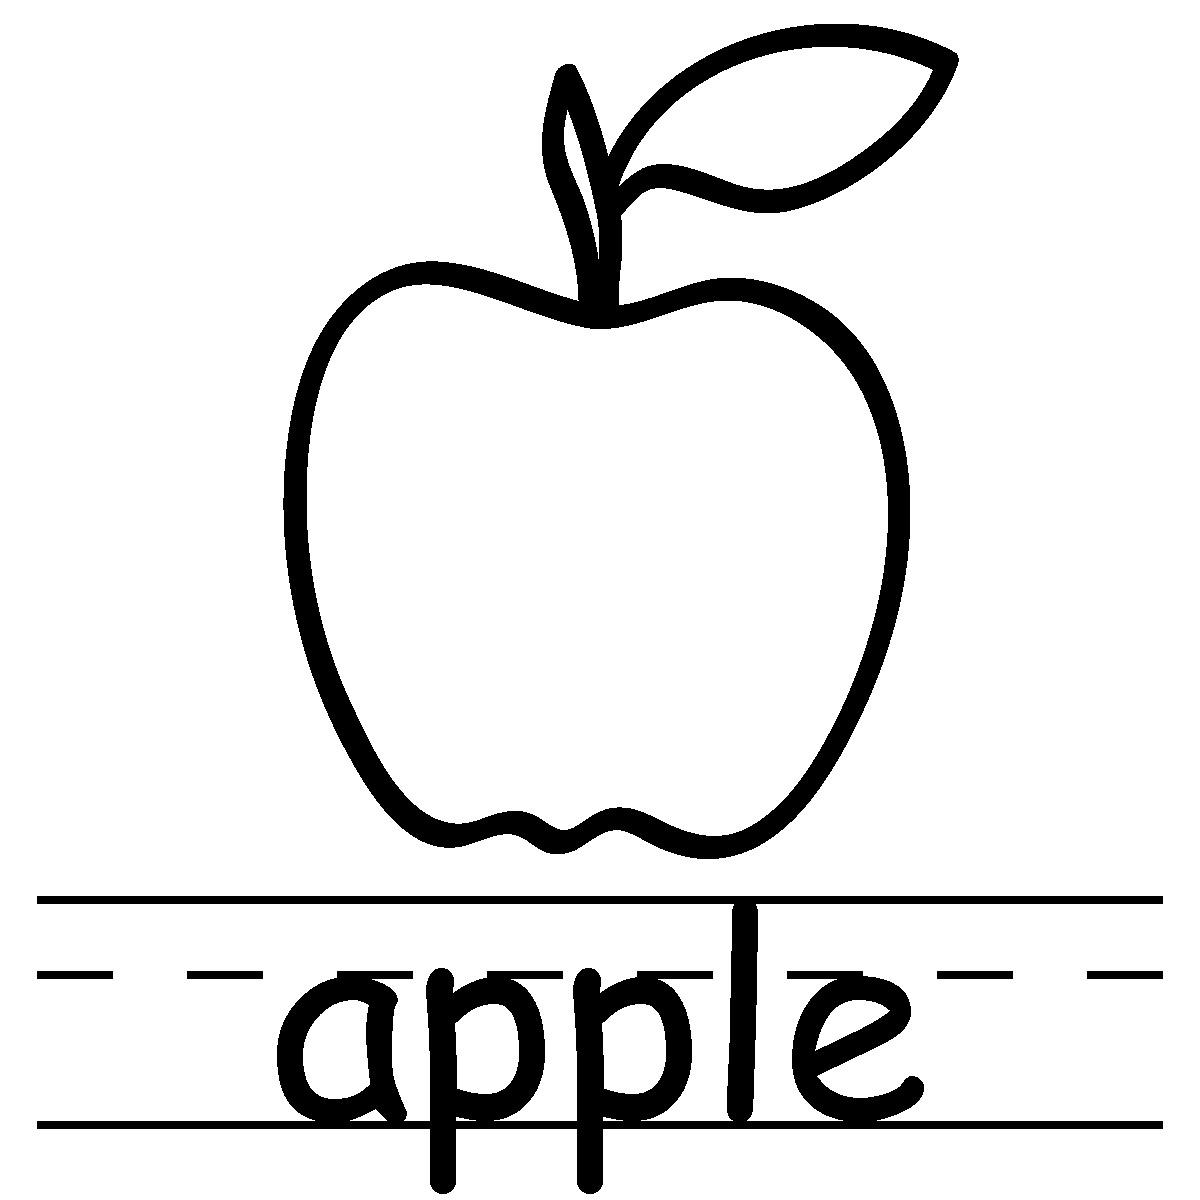 teacher apple clipart clipart panda free clipart images